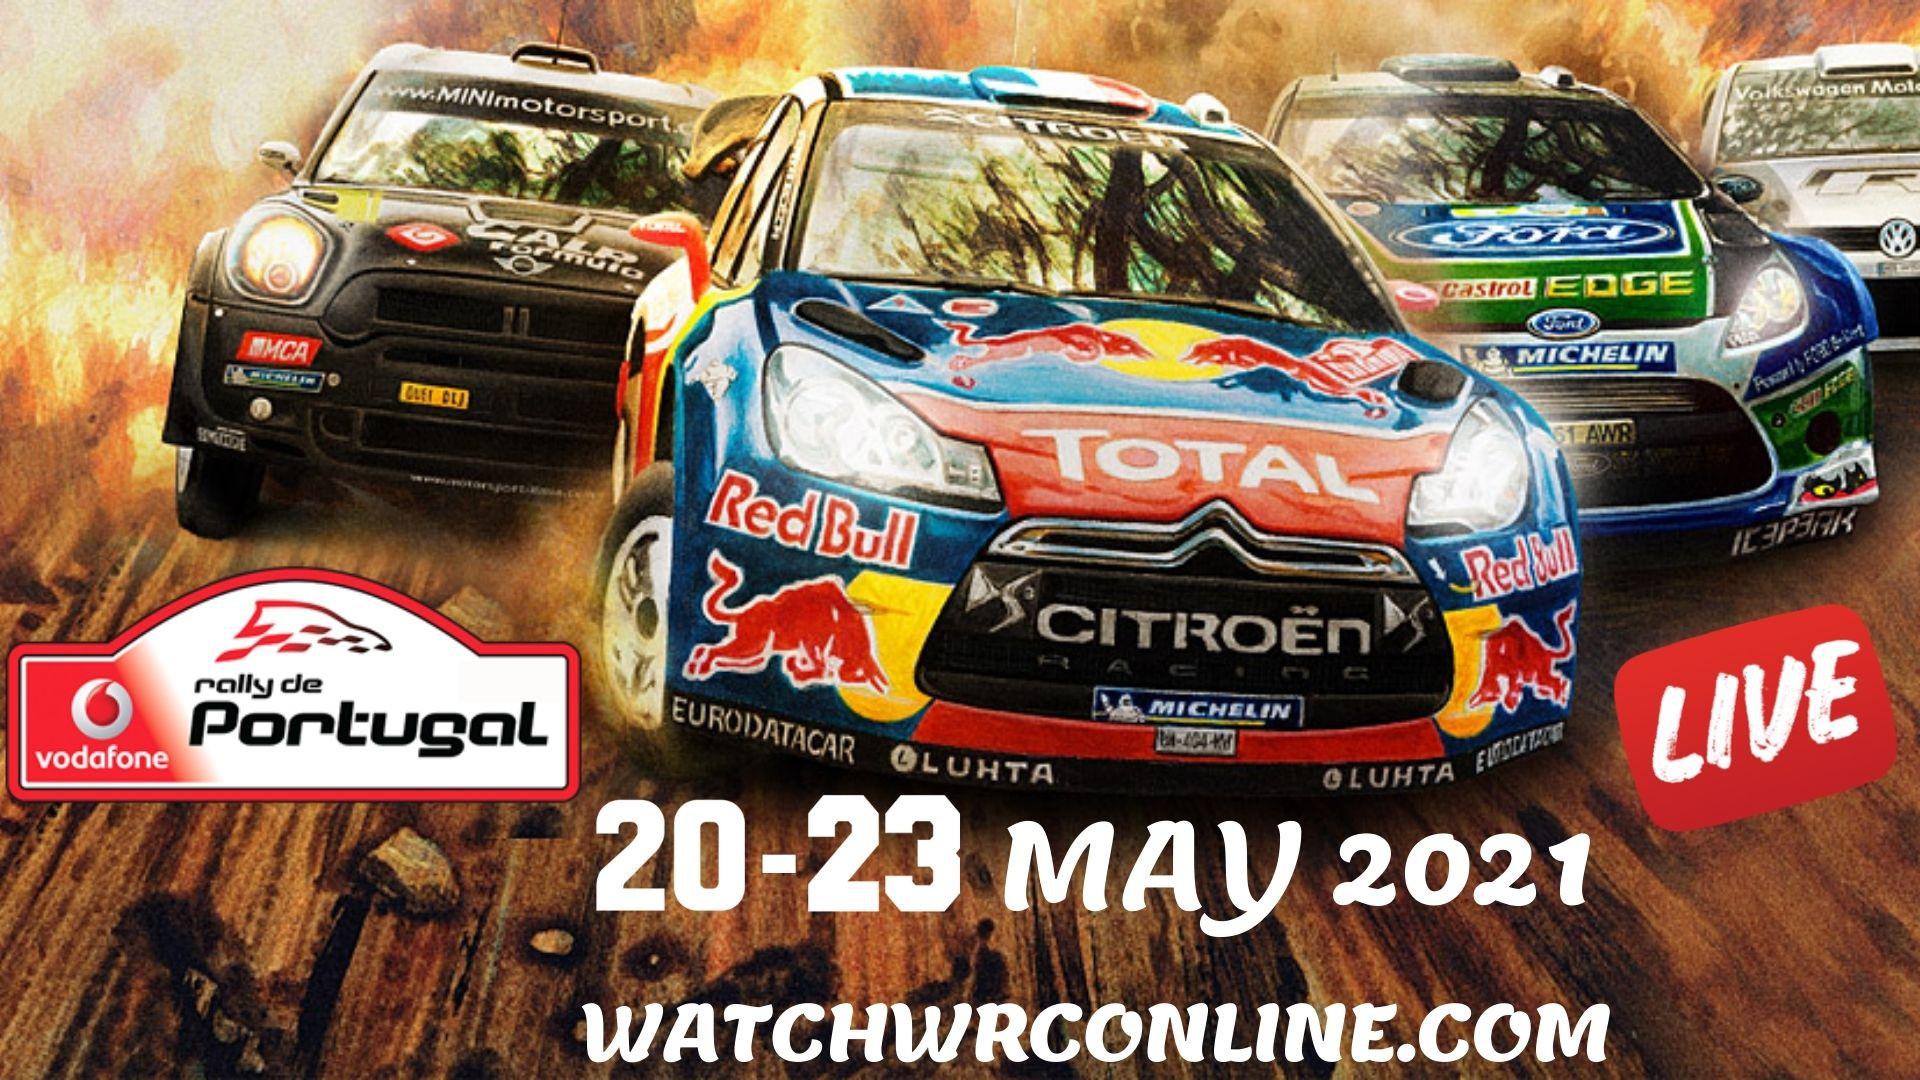 WRC Portugal Rally Live Stream 2021